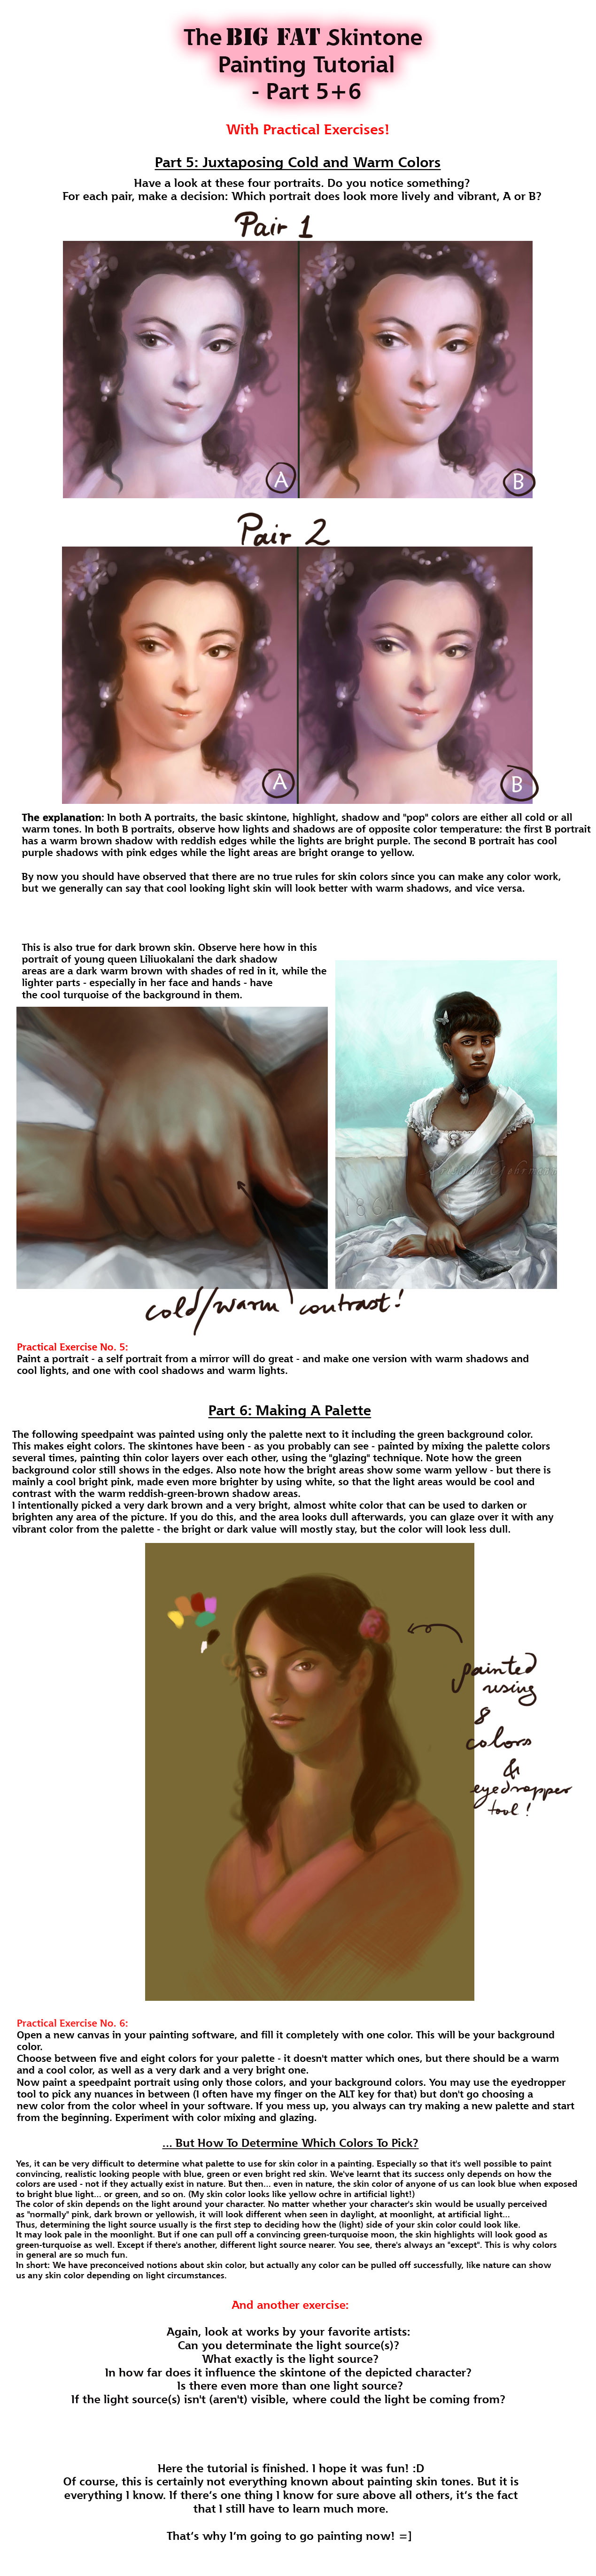 Skintone Tutorial part 5+6 by KristinaGehrmann